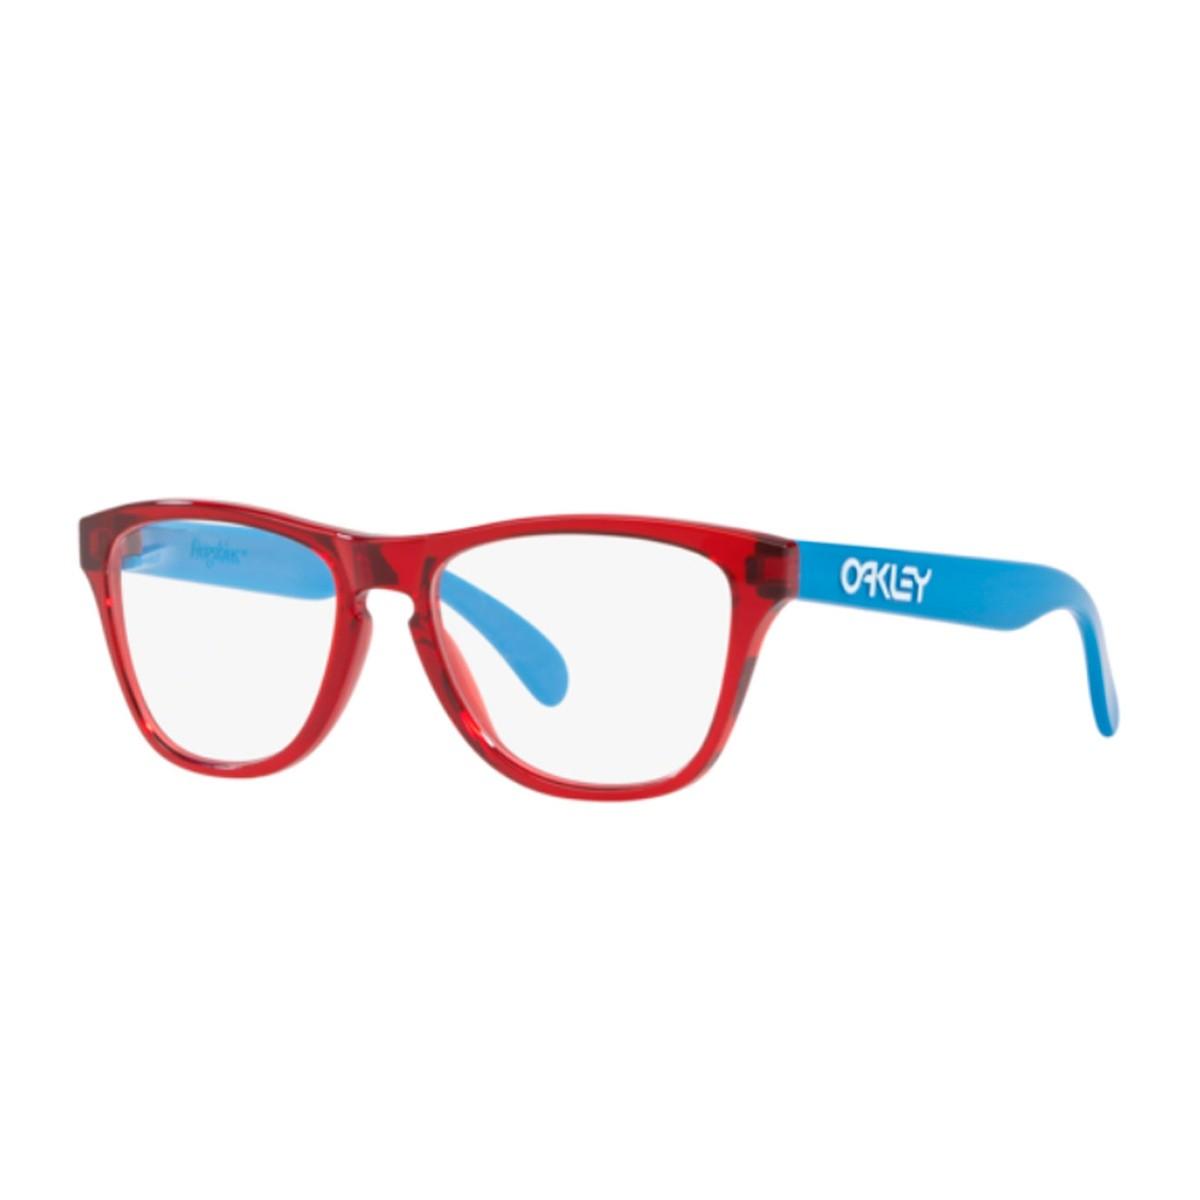 Oakley Youth Frogskins XS OY8009 Junior   Kids eyeglasses